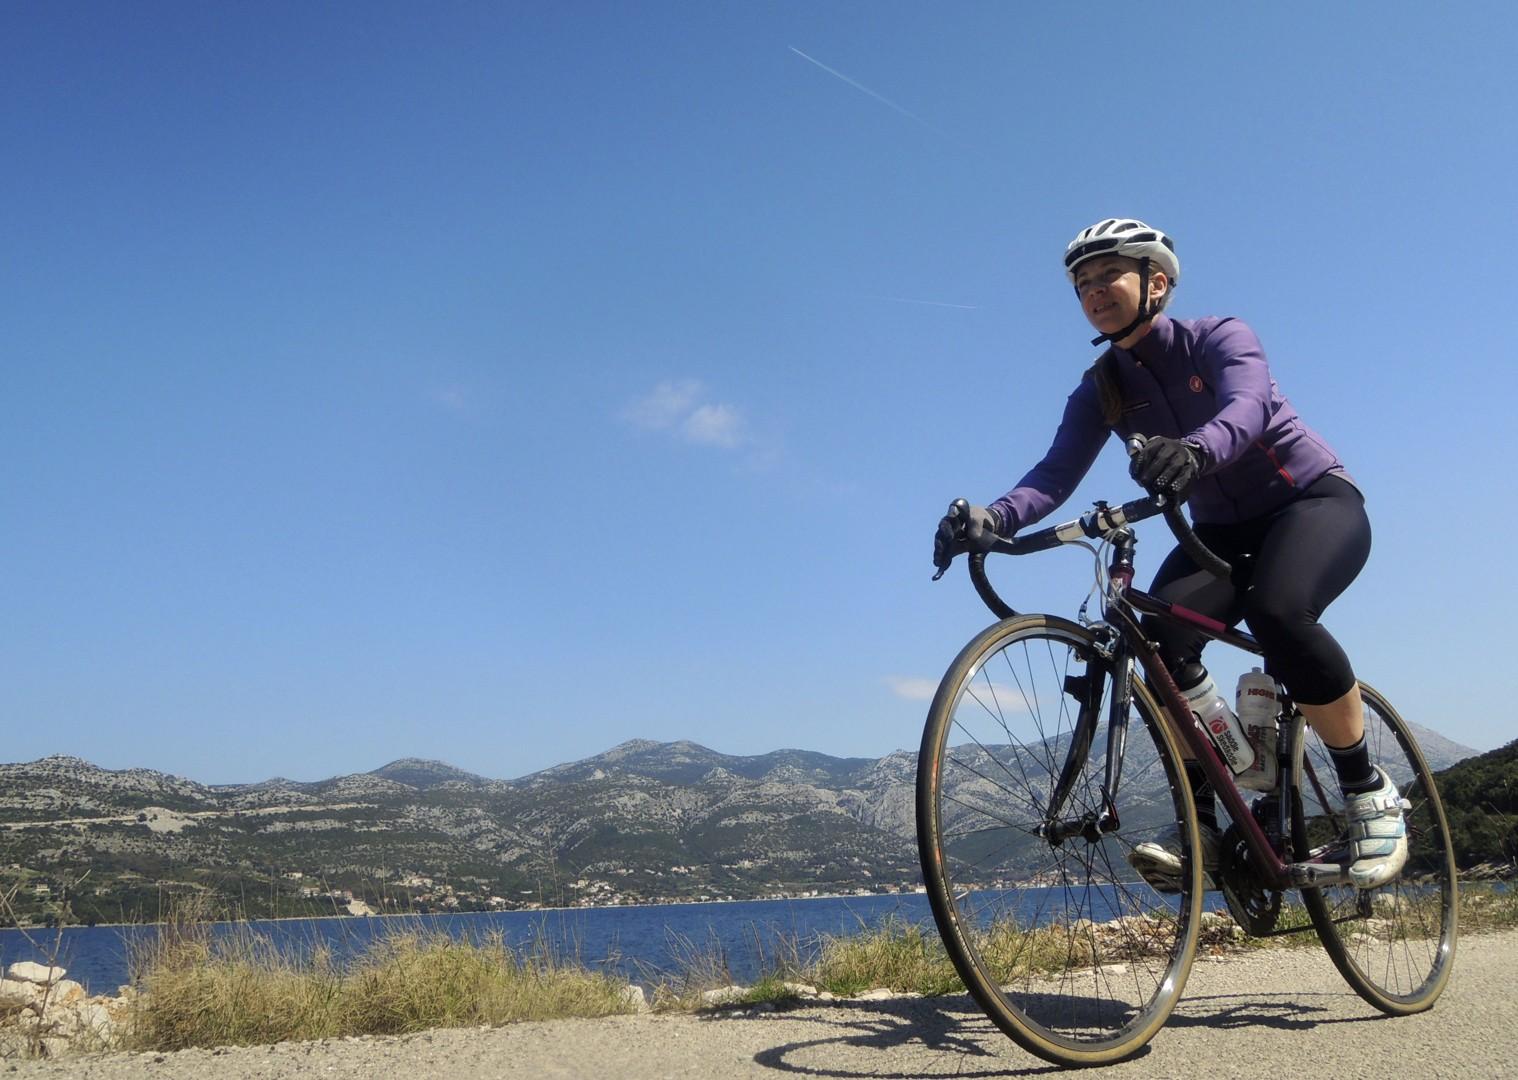 croatiaroad2.jpg - Slovenia and Croatia - Slovenian Alps to Dalmatian Coast - Guided Road Cycling Holiday - Road Cycling